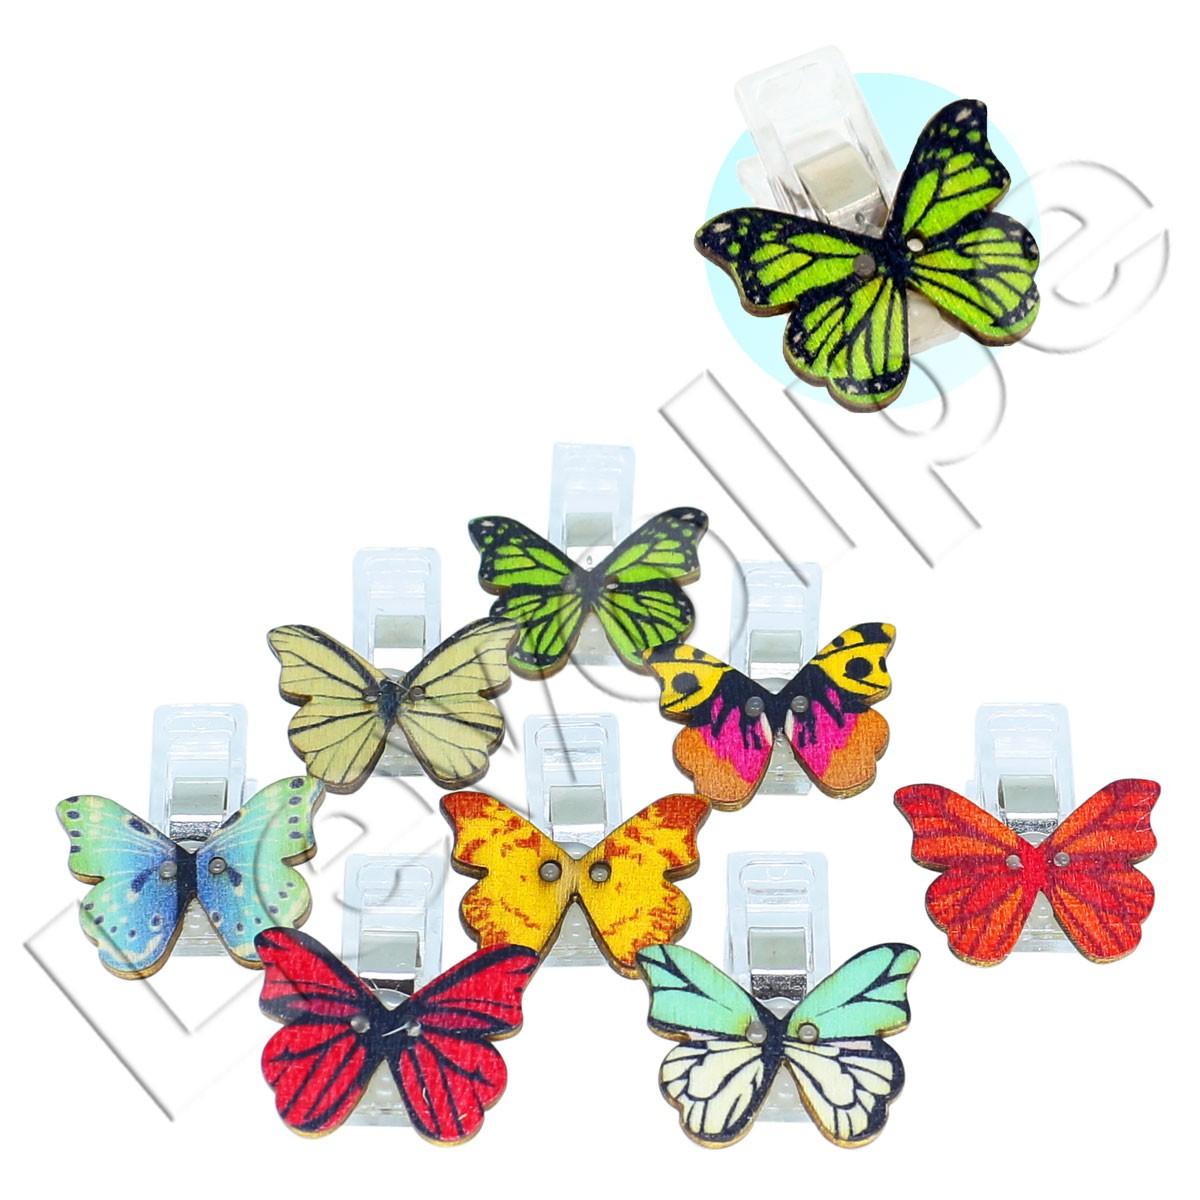 10 Mini Prendedor Clips Prender Plástico Pequenos Borboleta